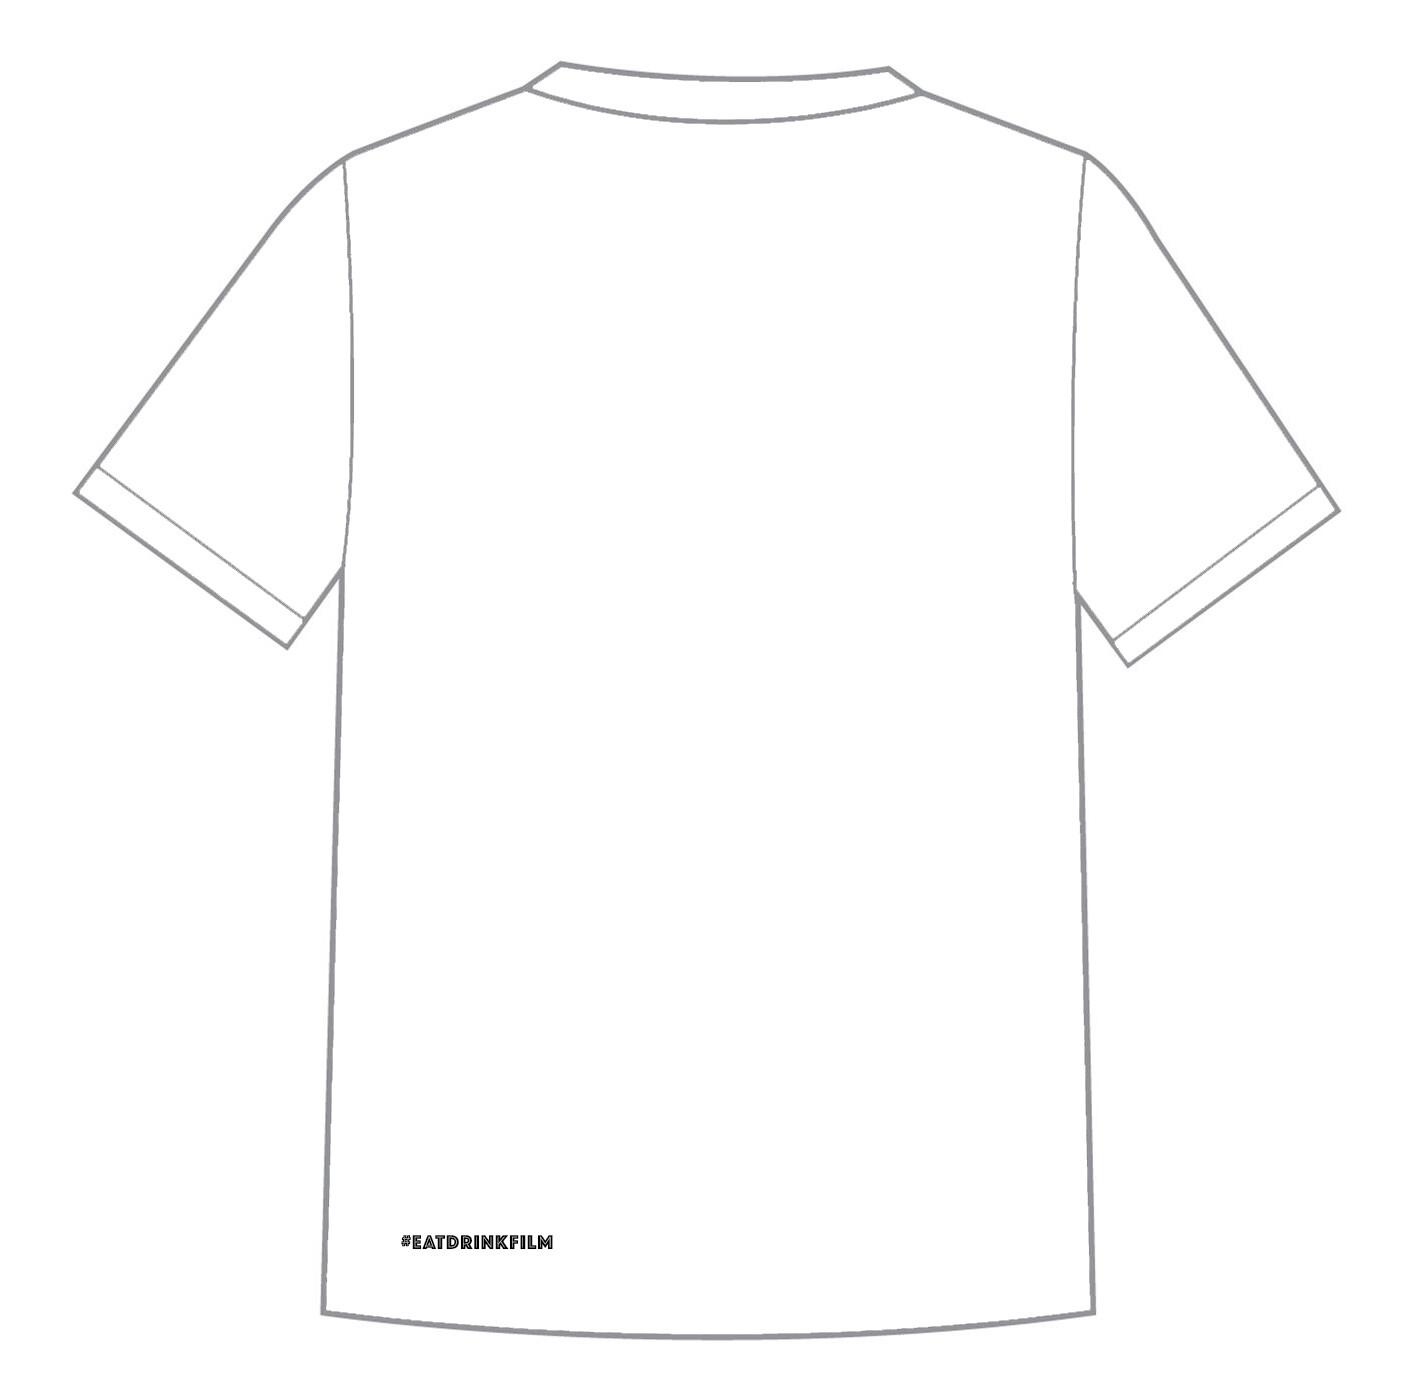 MB T-shirt (white)